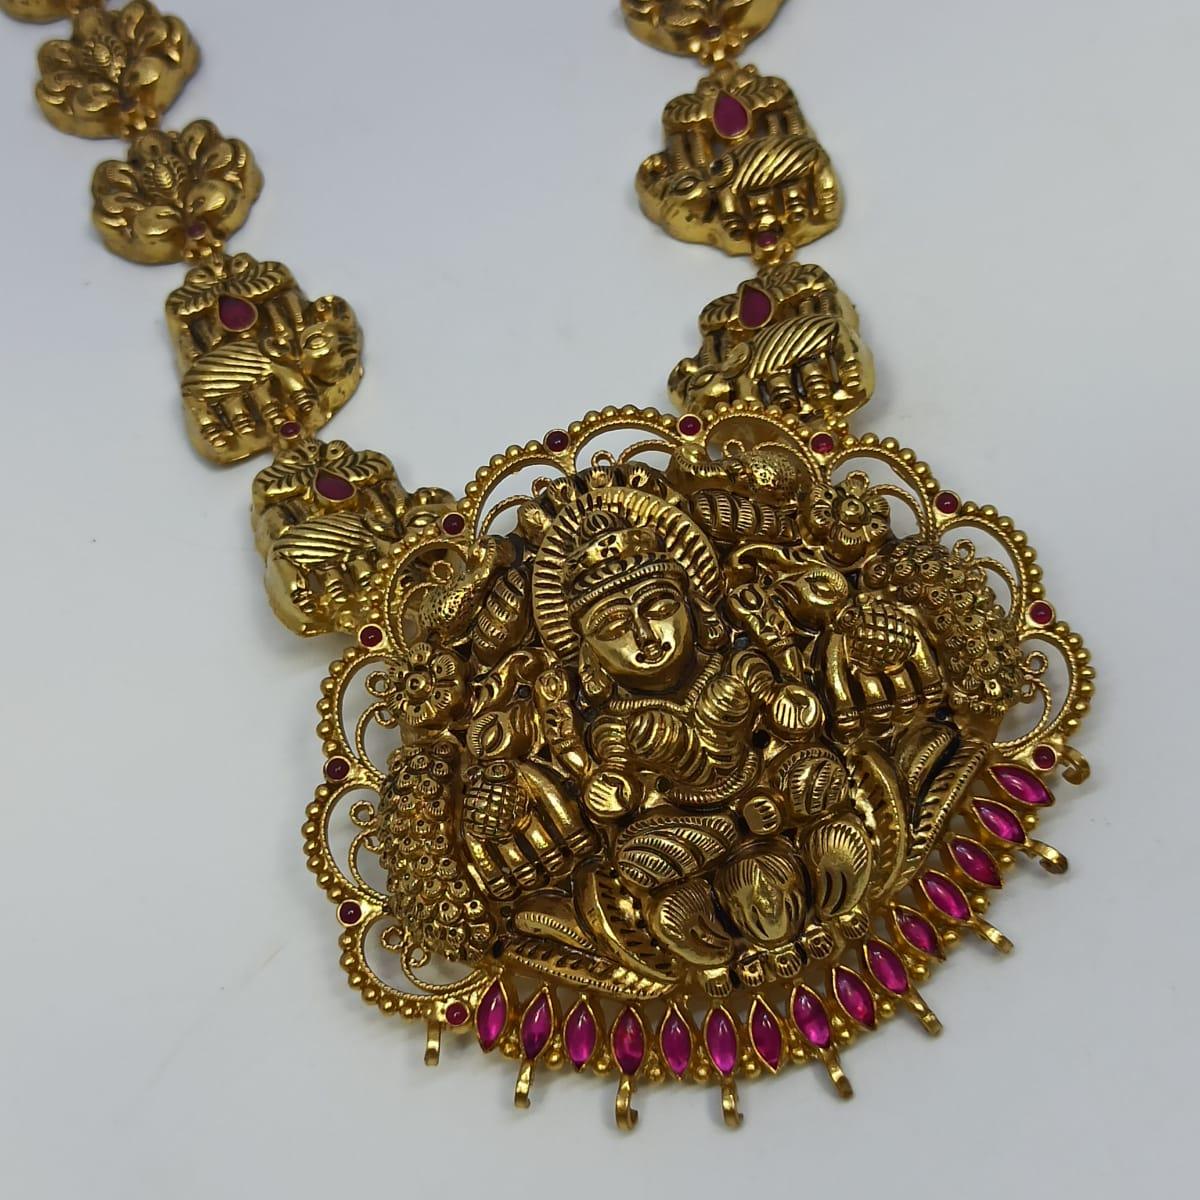 Vidhya Antique Necklace